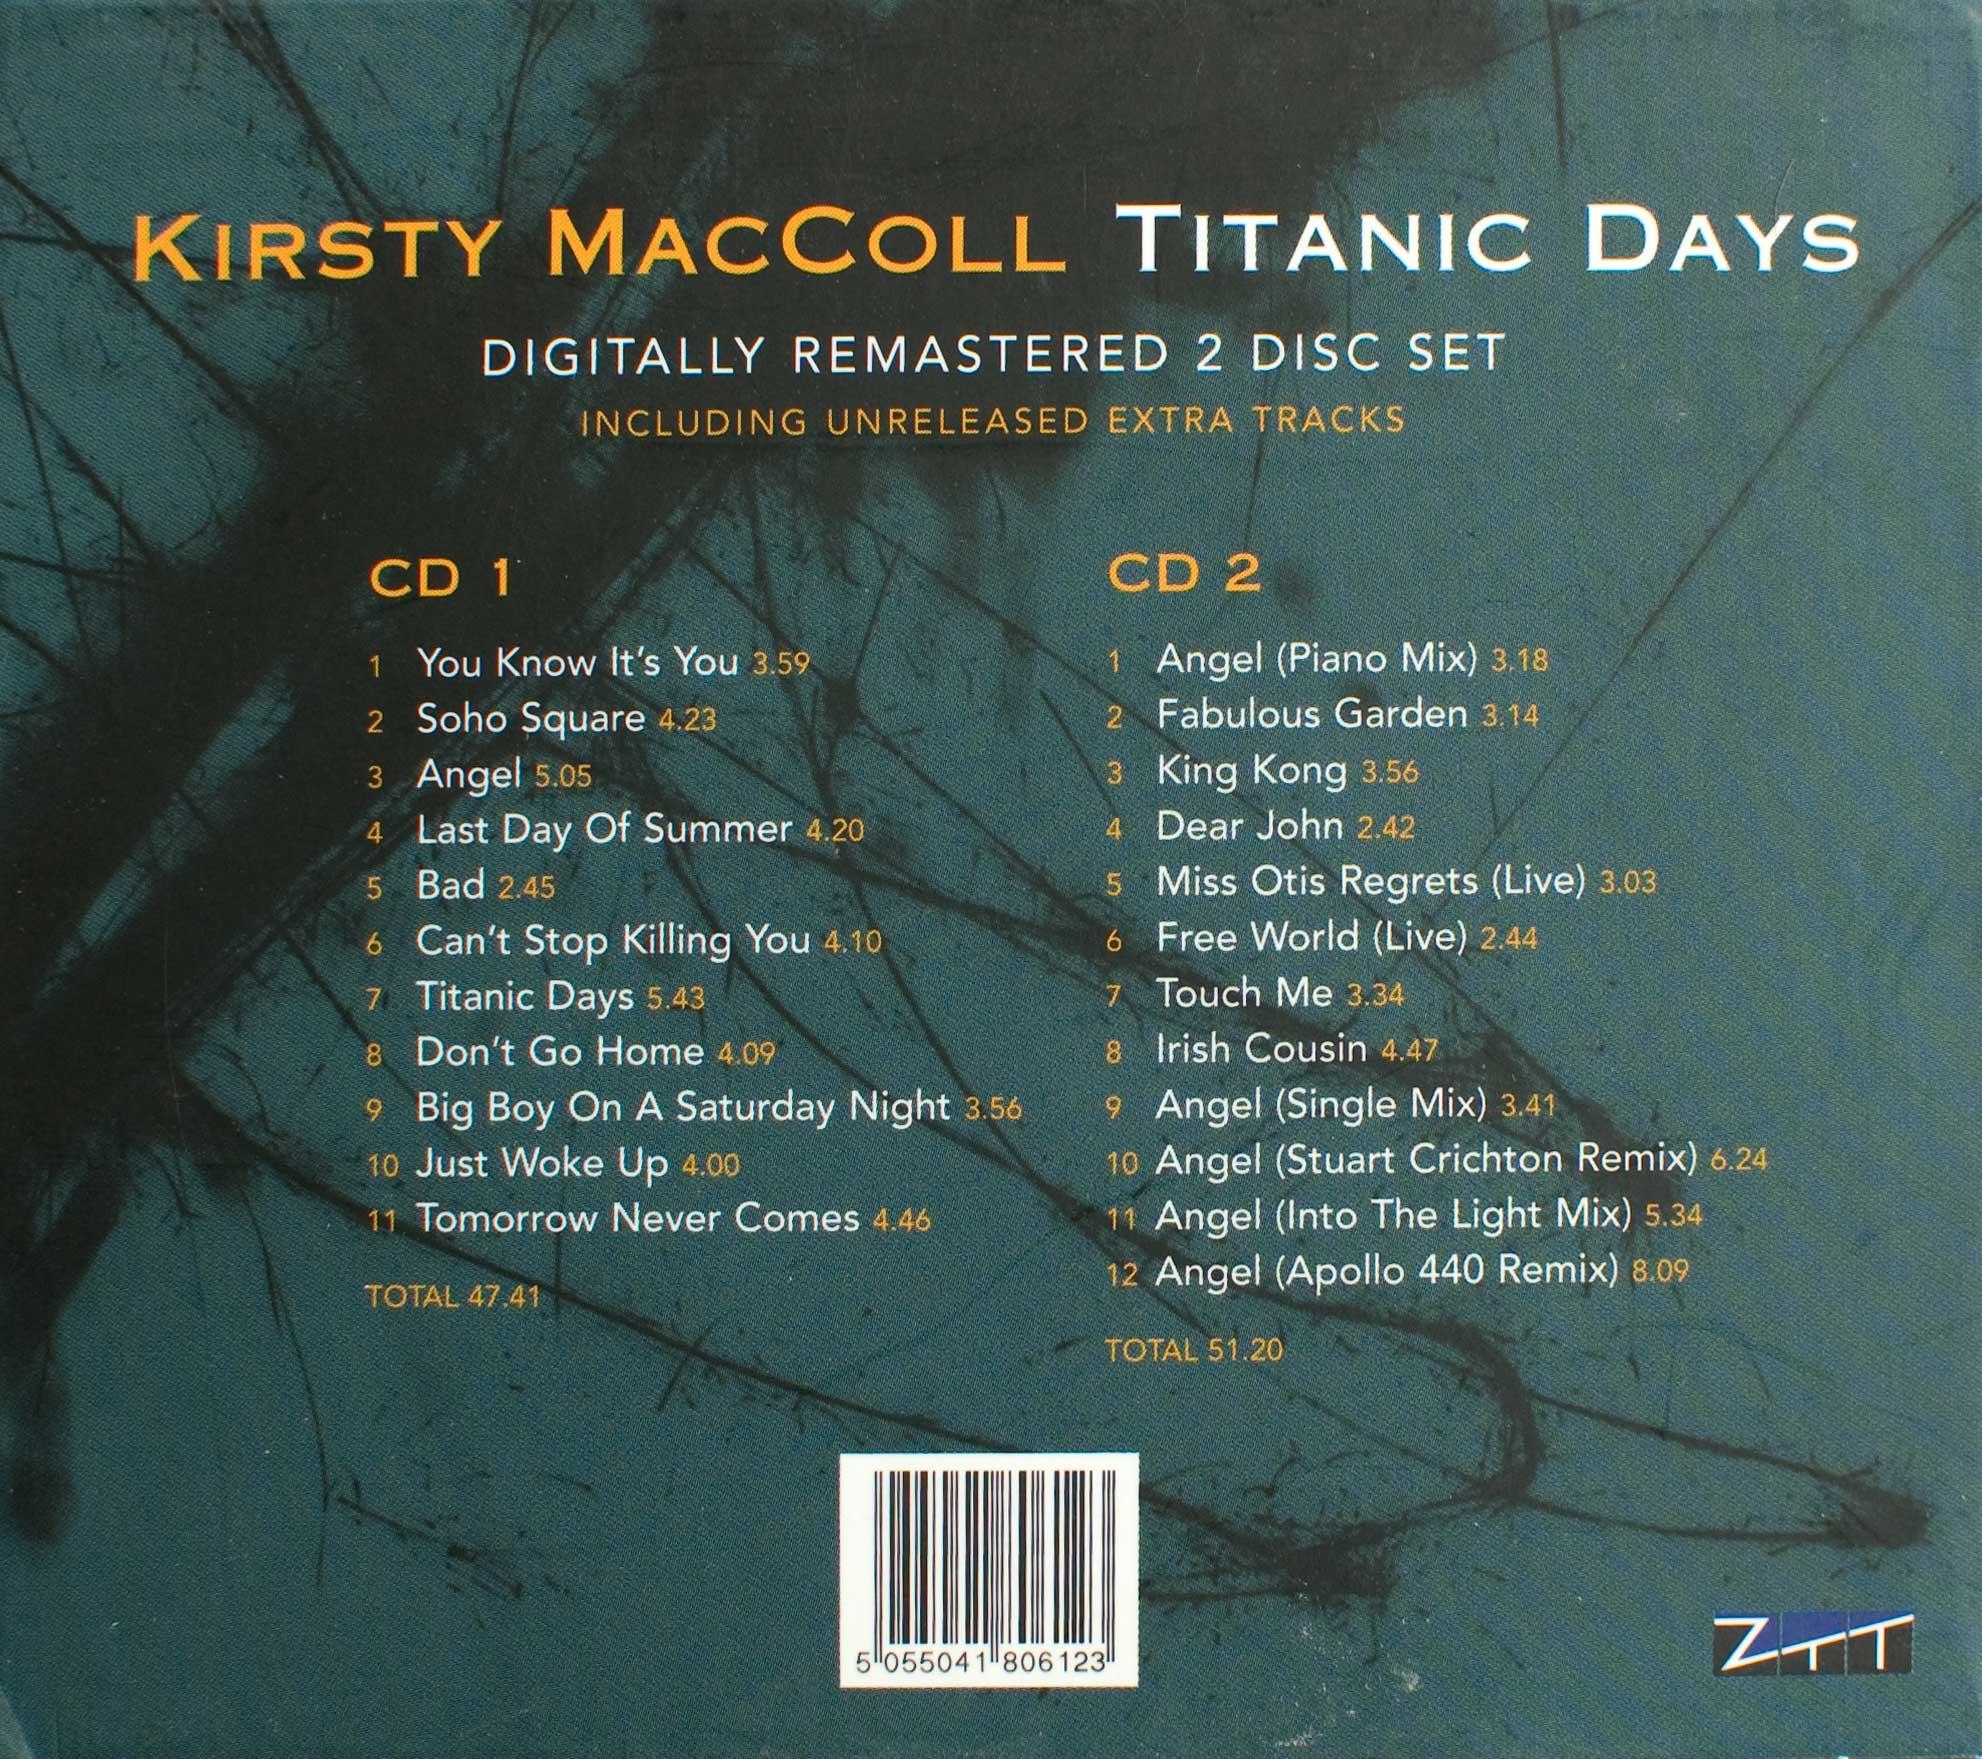 titanic days 2005 cd kirsty maccoll